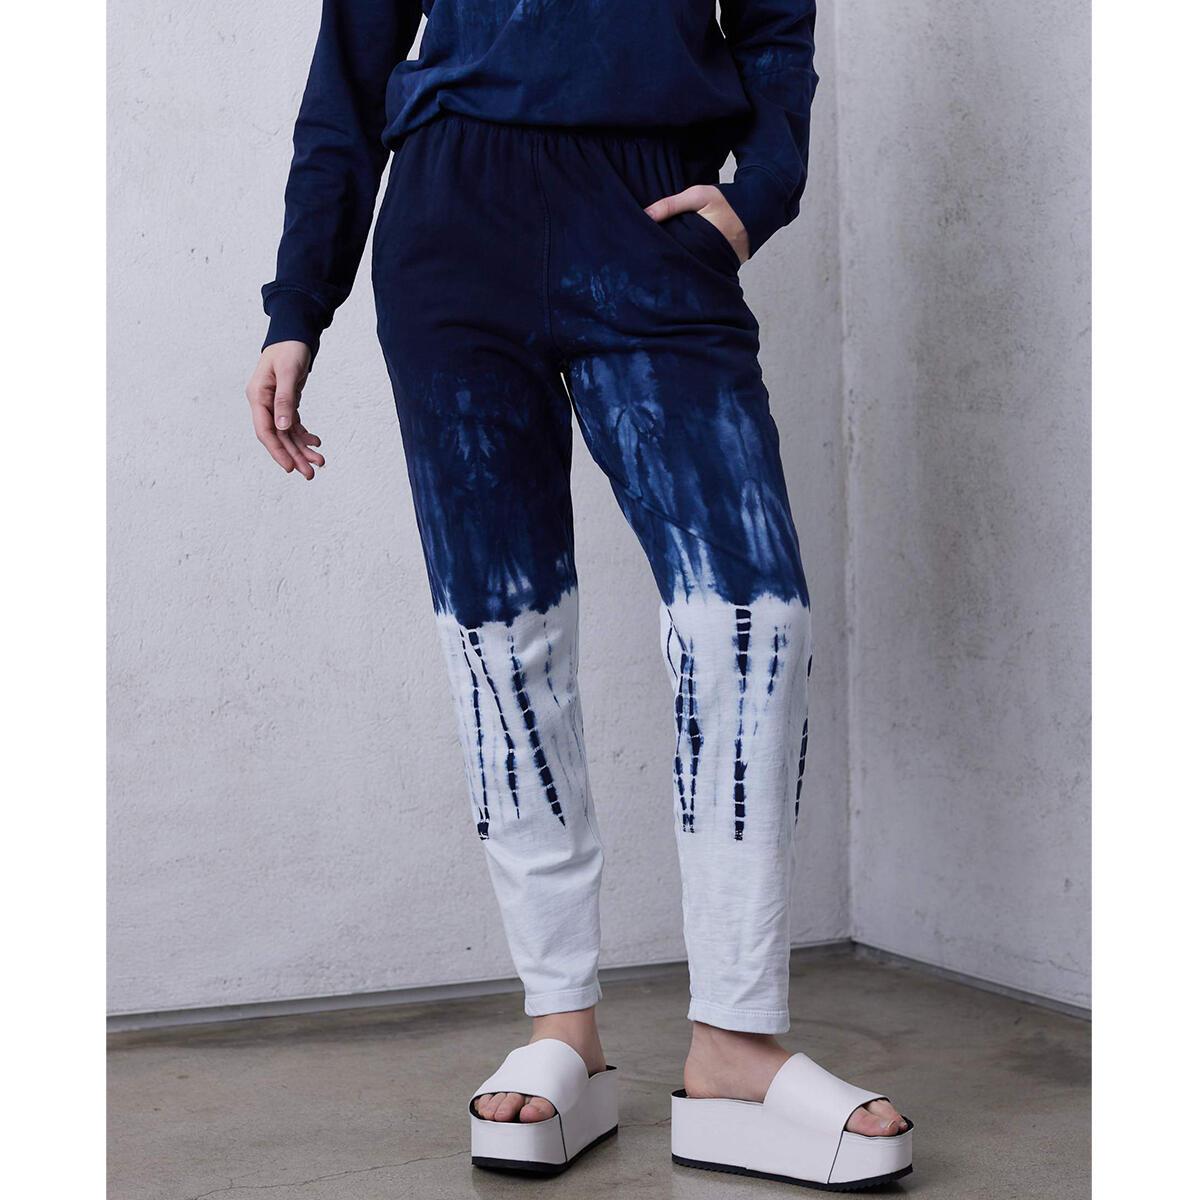 Hilma Ankle Pant – Indigo/White